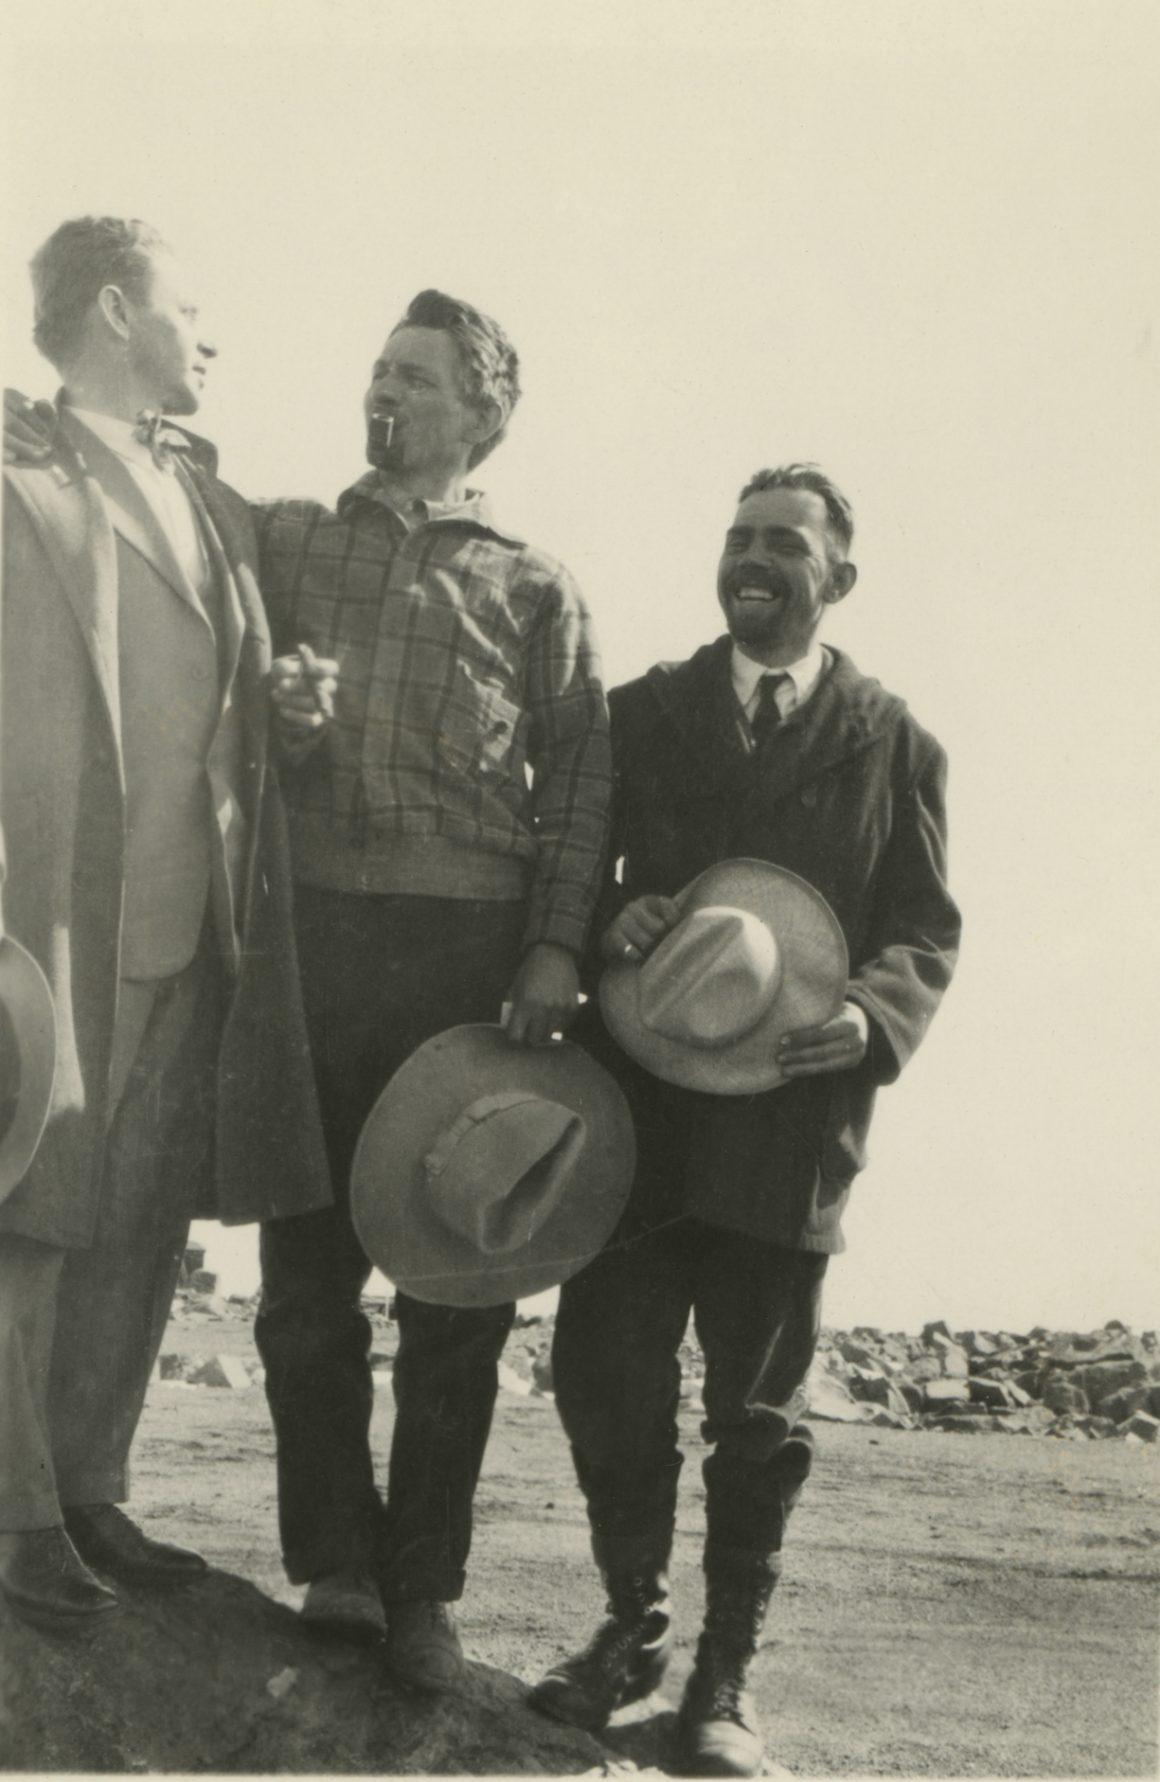 Mruk, Bakos and Jonson, 1926-1927